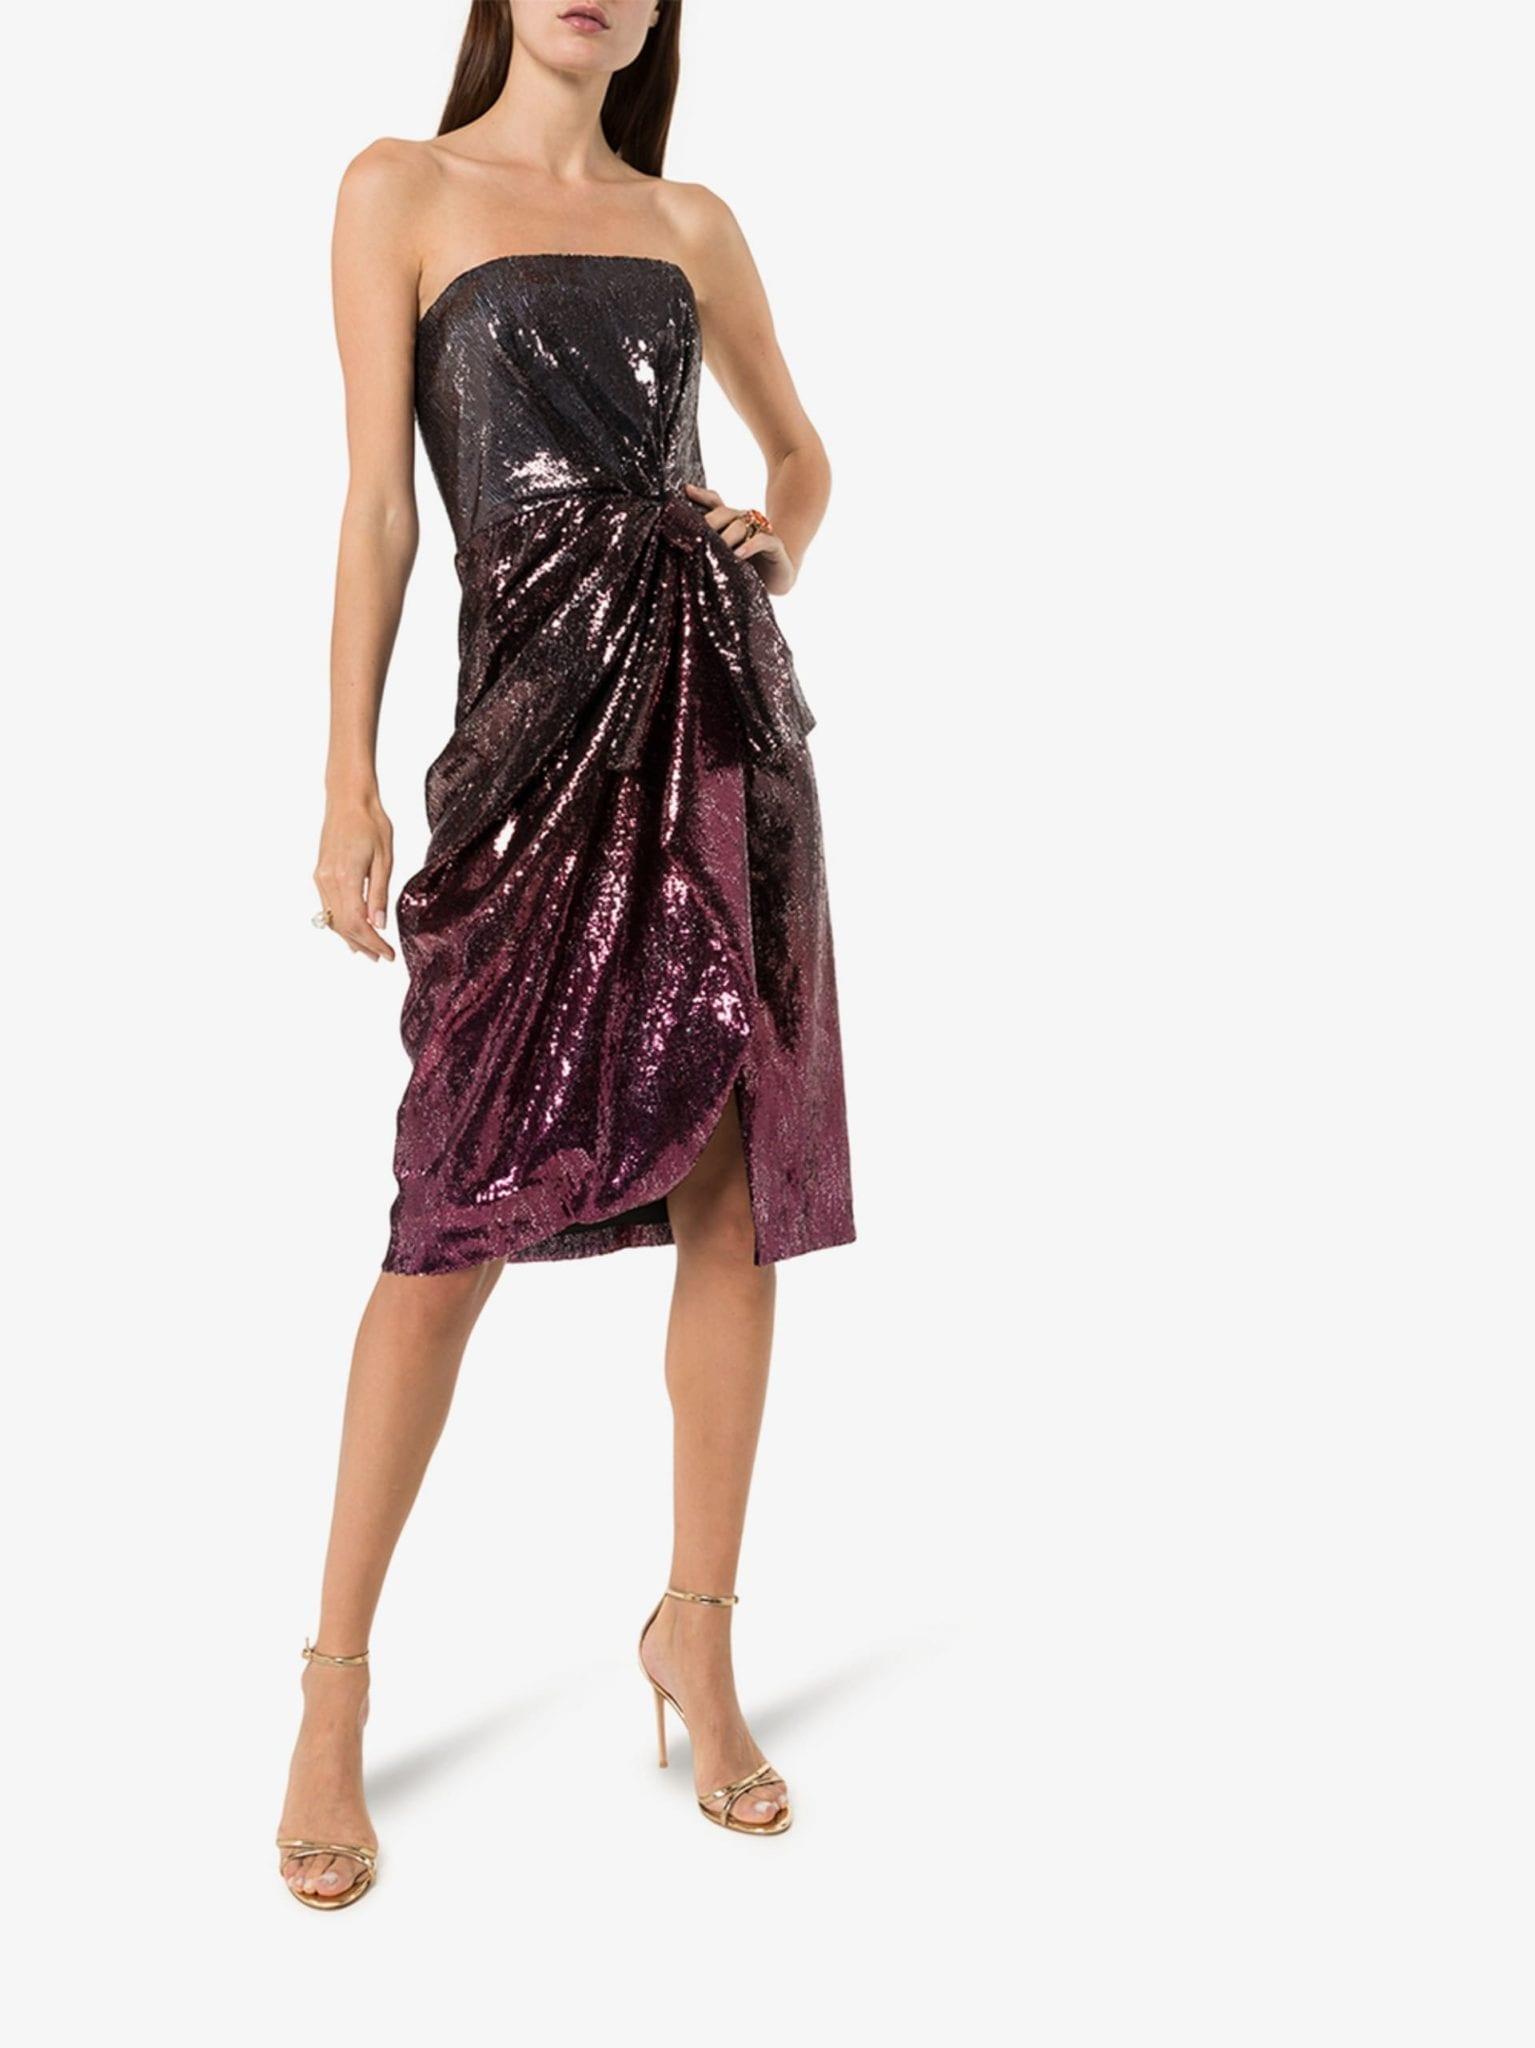 MARY KATRANTZOU Kylie Strapless Sequin Dress